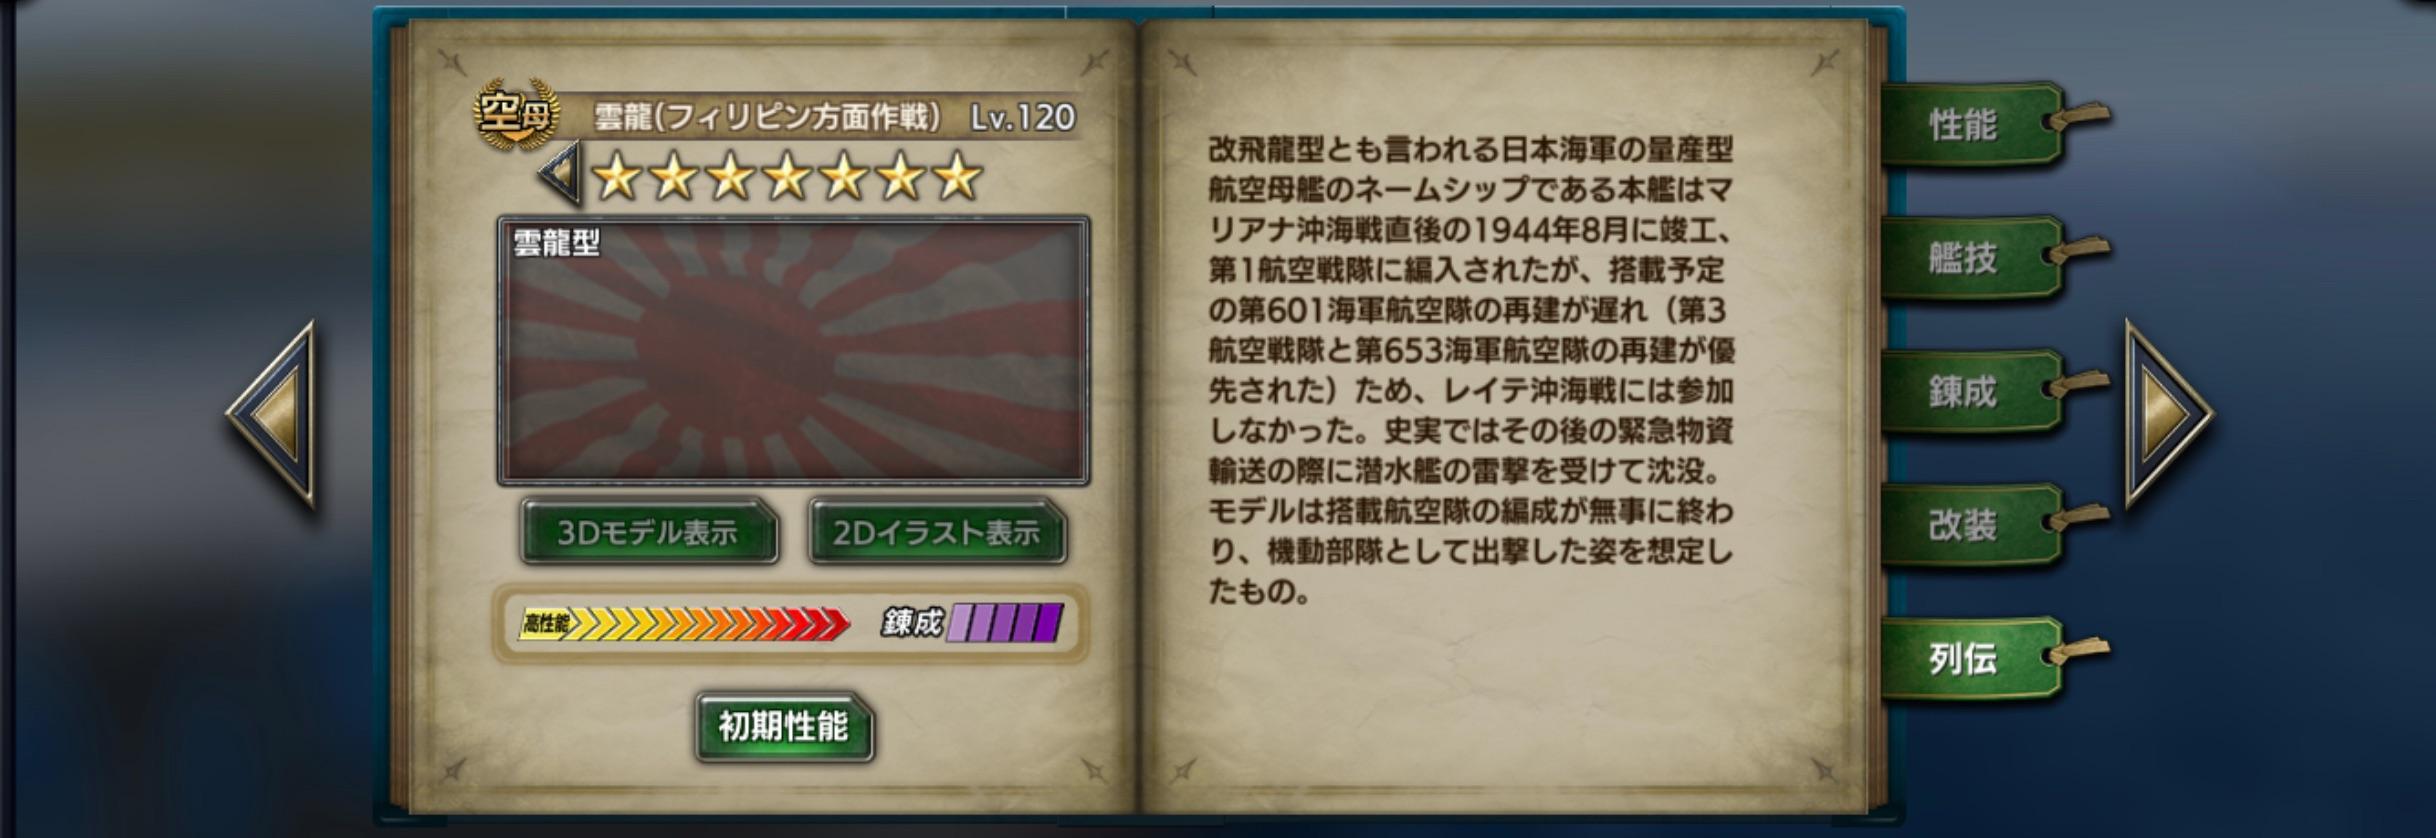 UnryuF-history